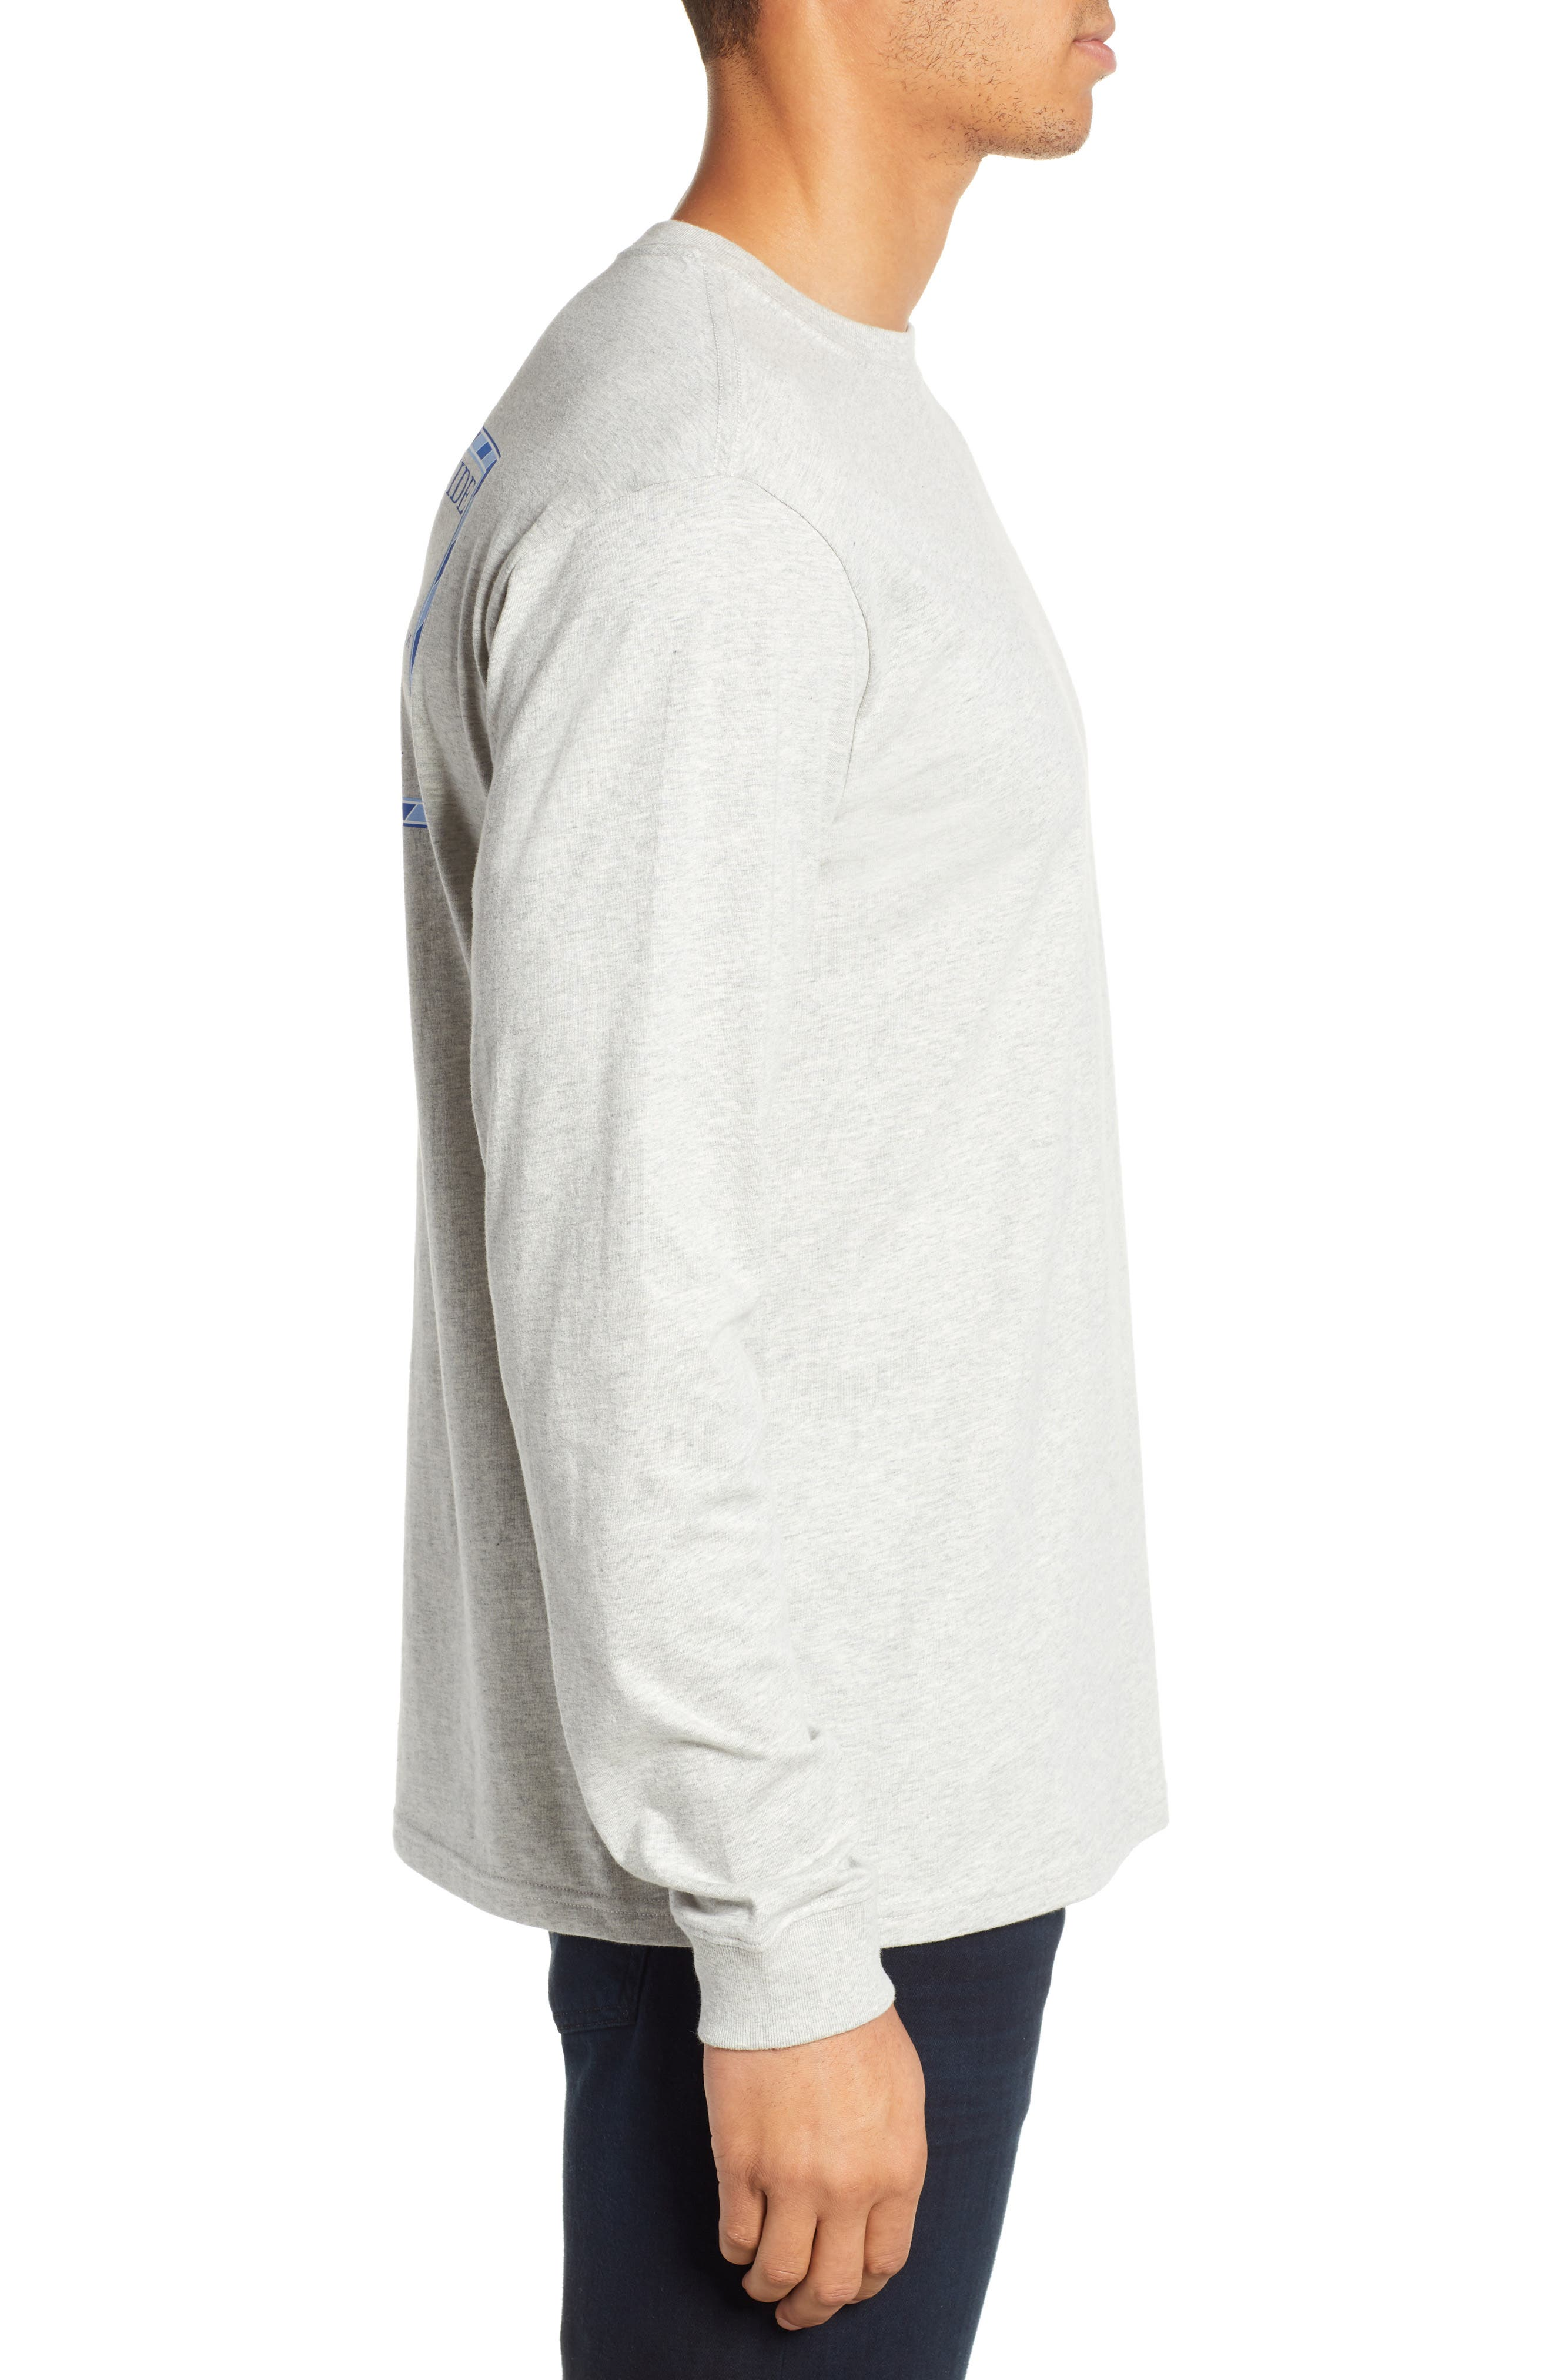 Original Skipjack T-Shirt,                             Alternate thumbnail 3, color,                             LIGHT GREY